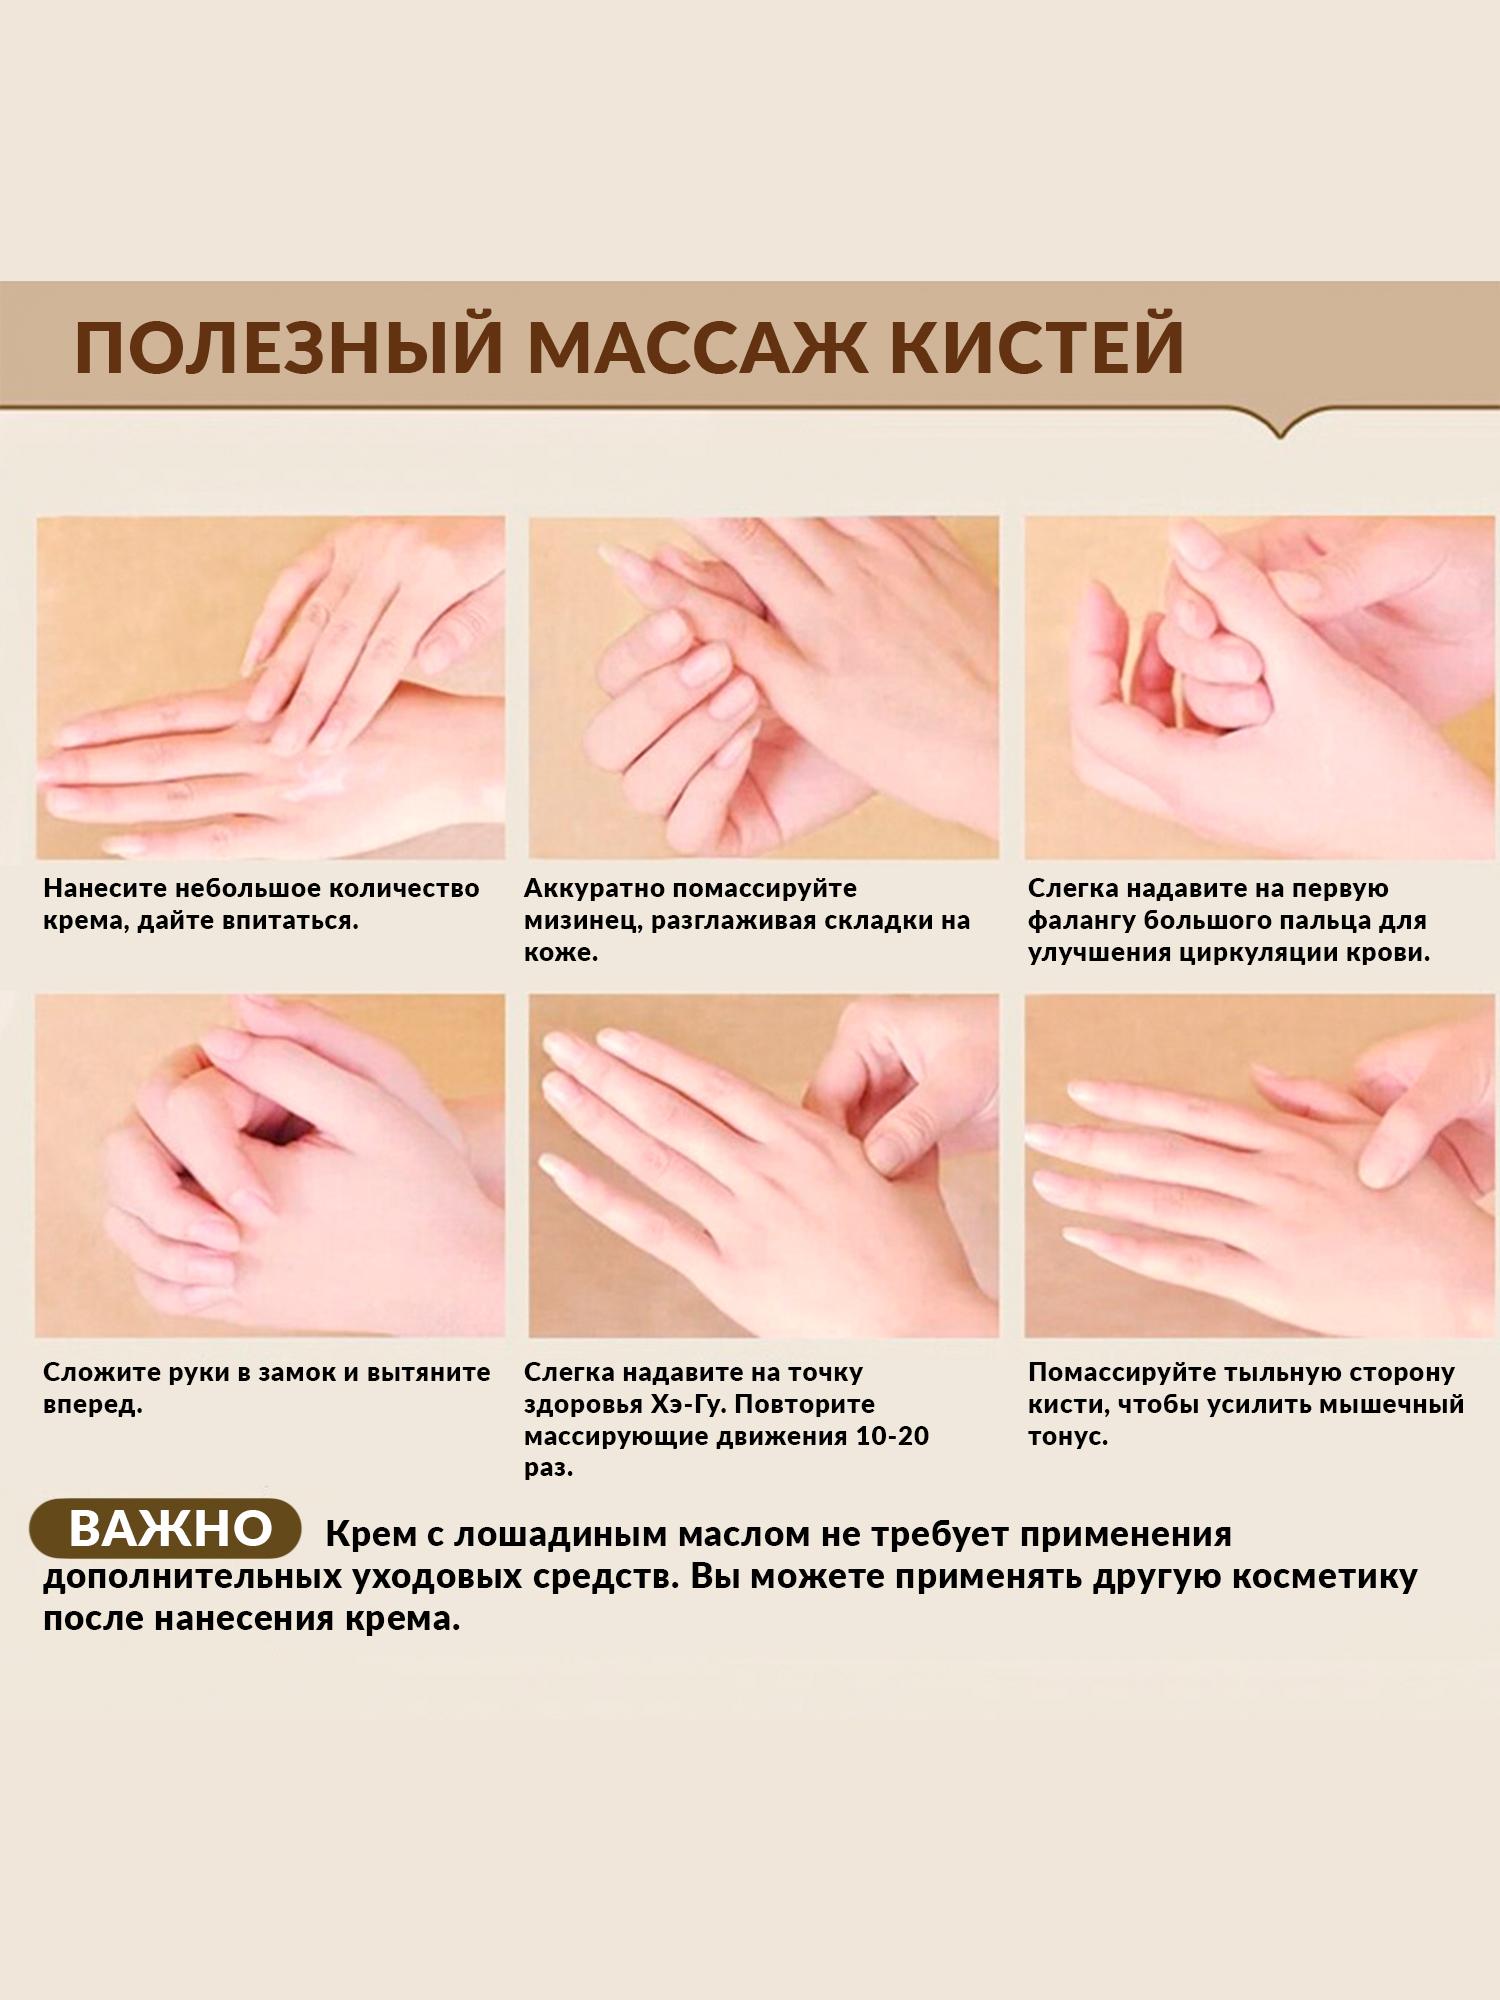 Увлажняющий крем для рук Horseoil, 60гр